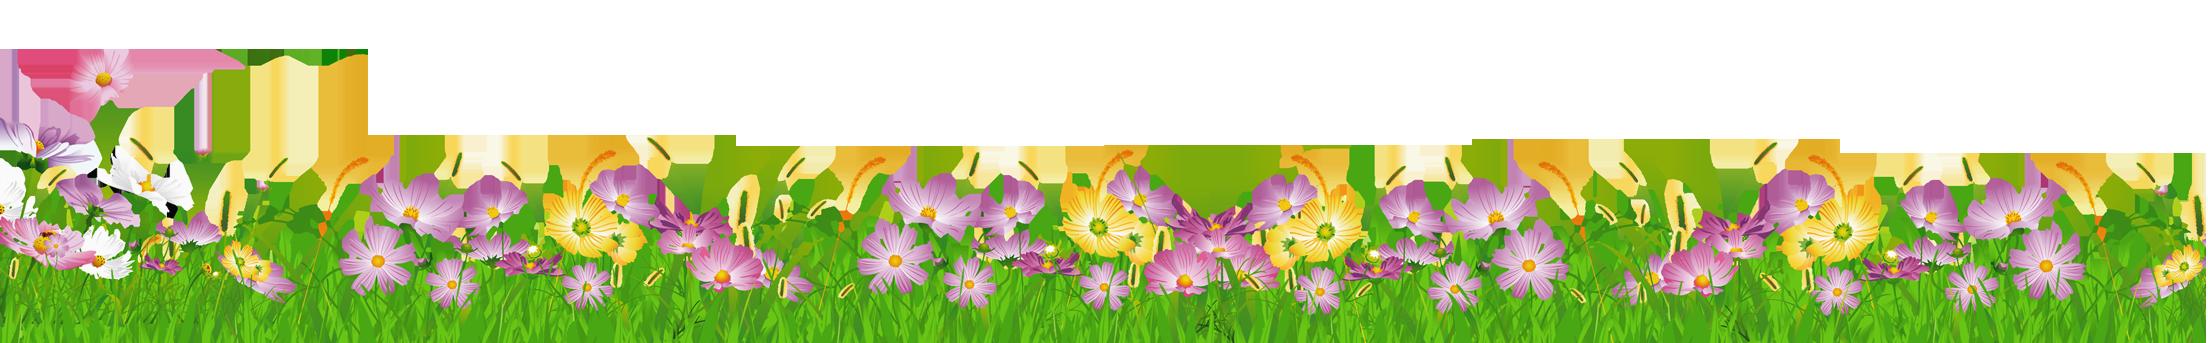 Dandelion clipart rice grass. Daisy grassy frames illustrations